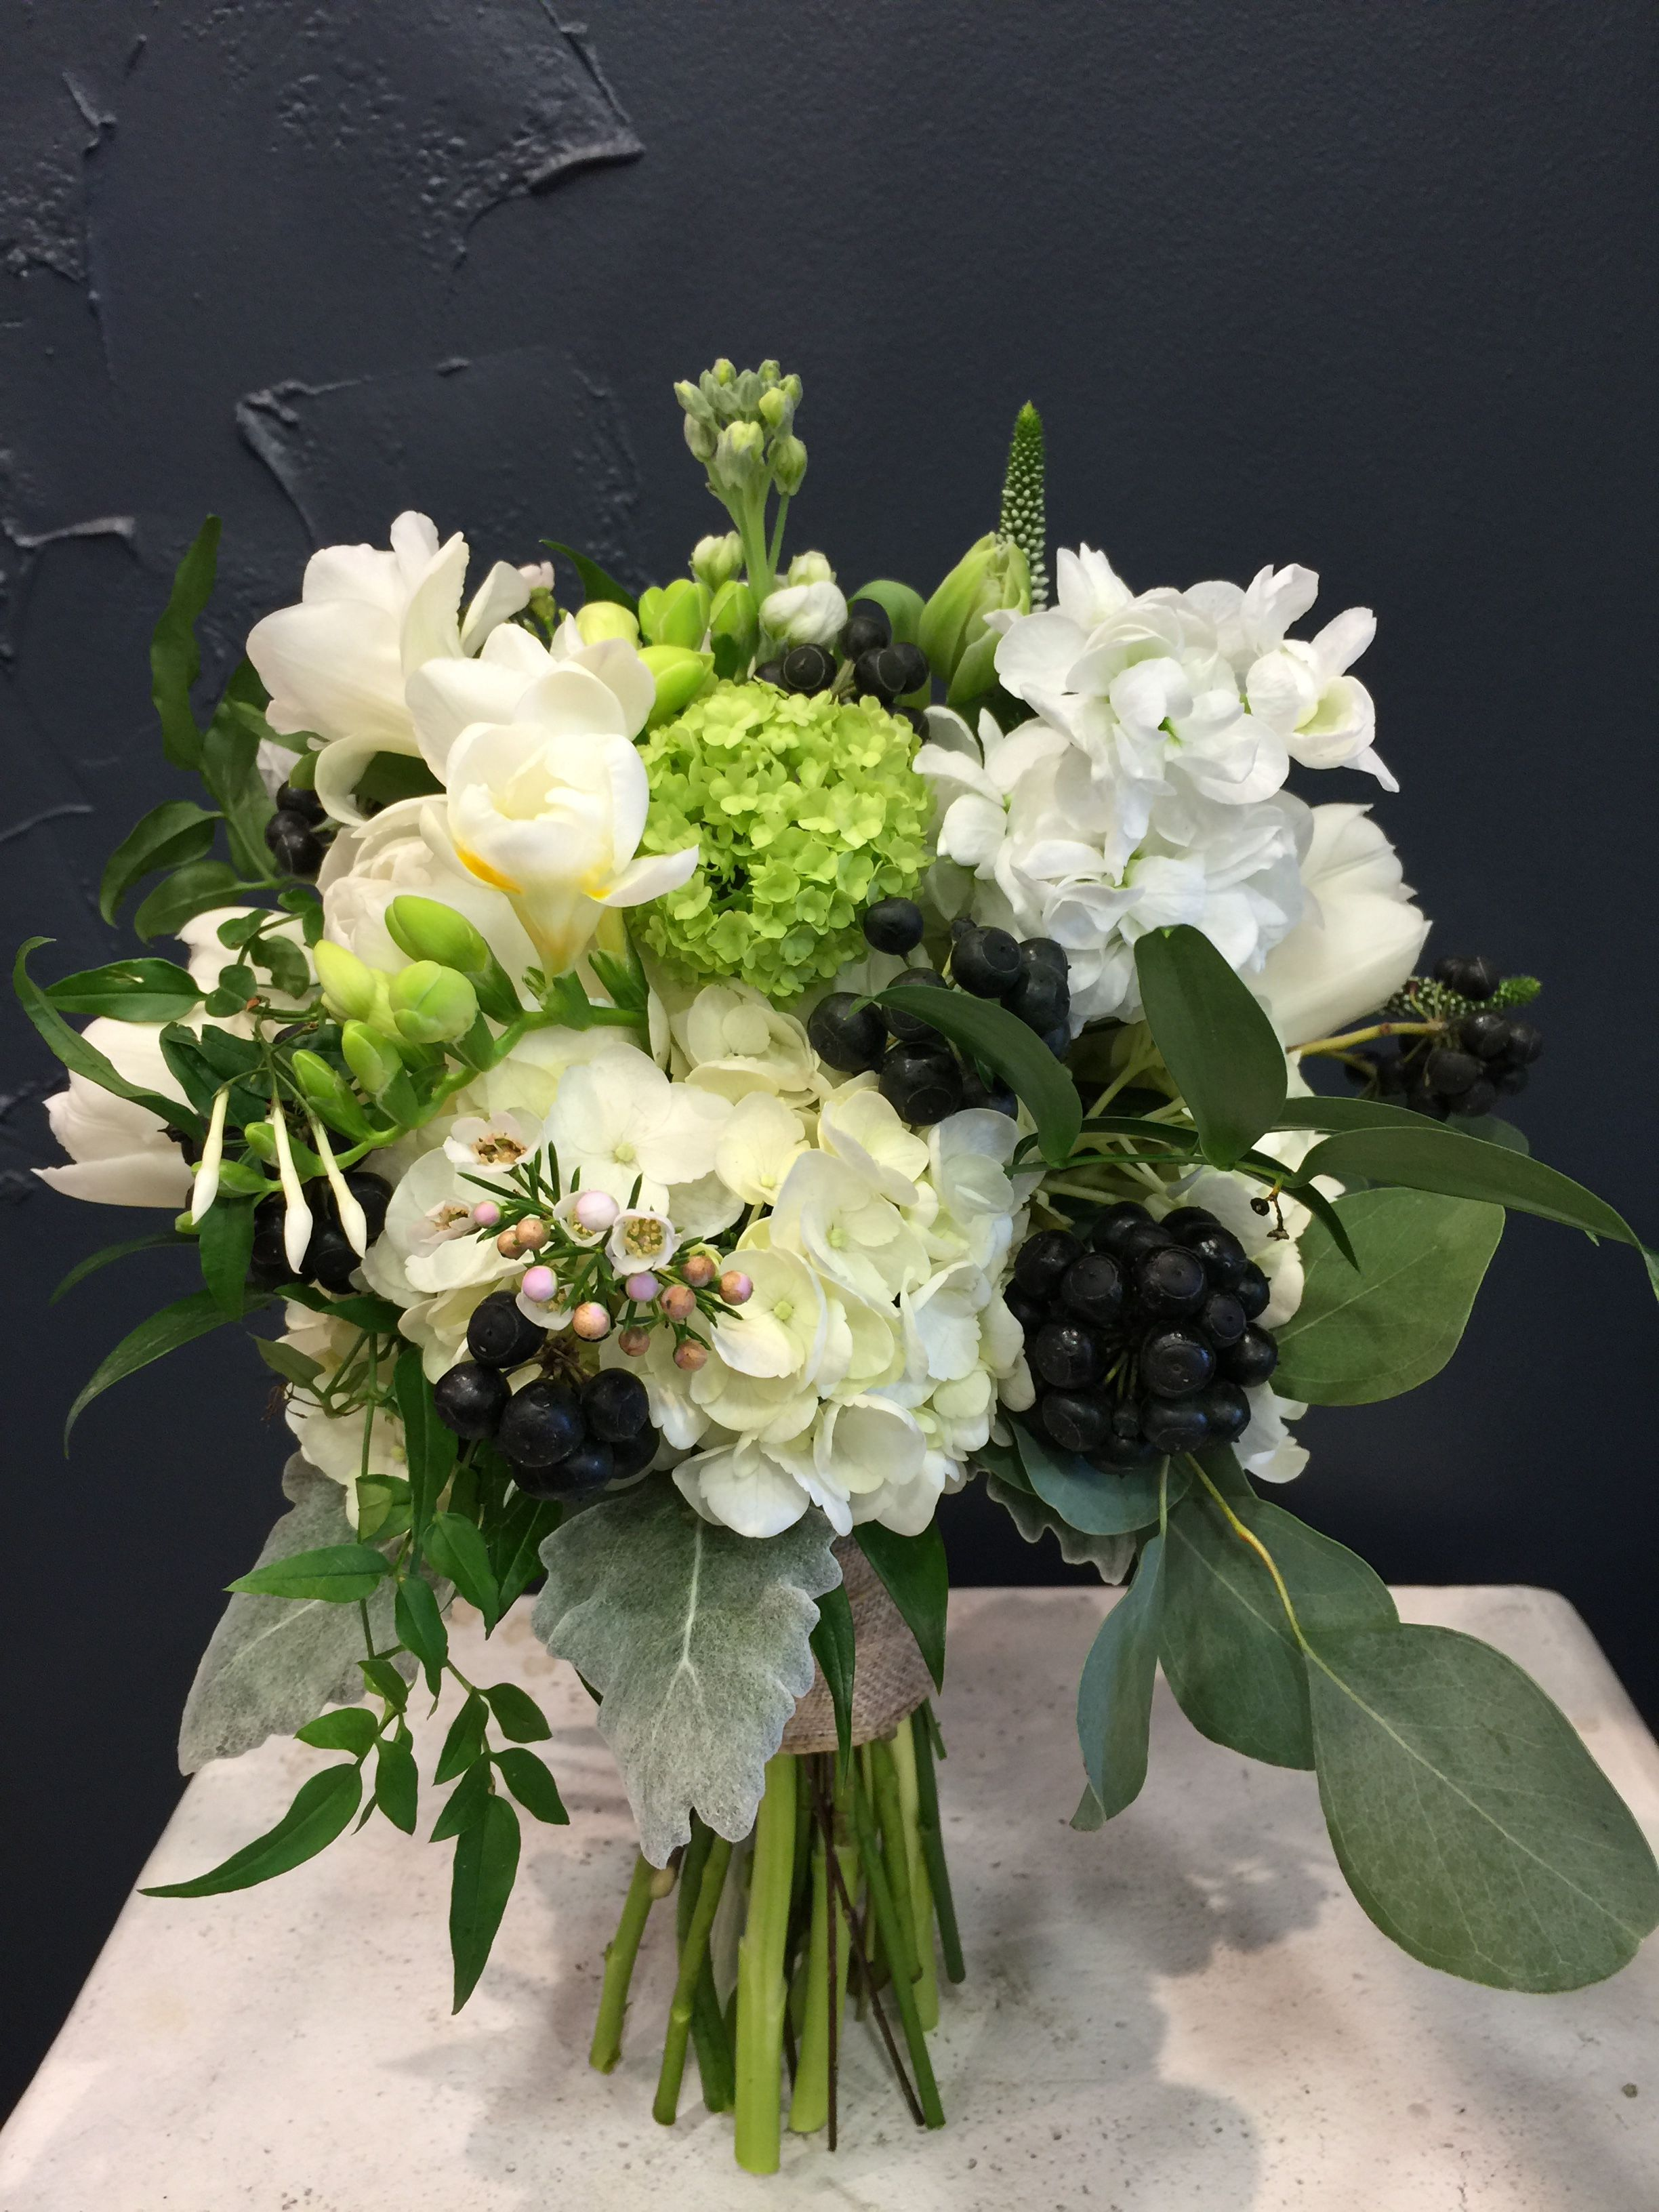 Beautiful Bridal Bouquet With Hydrangea Jasmine Freesia Genista Viburnum Veronica Eu Wedding Flowers Beautiful Bridal Bouquet Garden Rose Bouquet Wedding